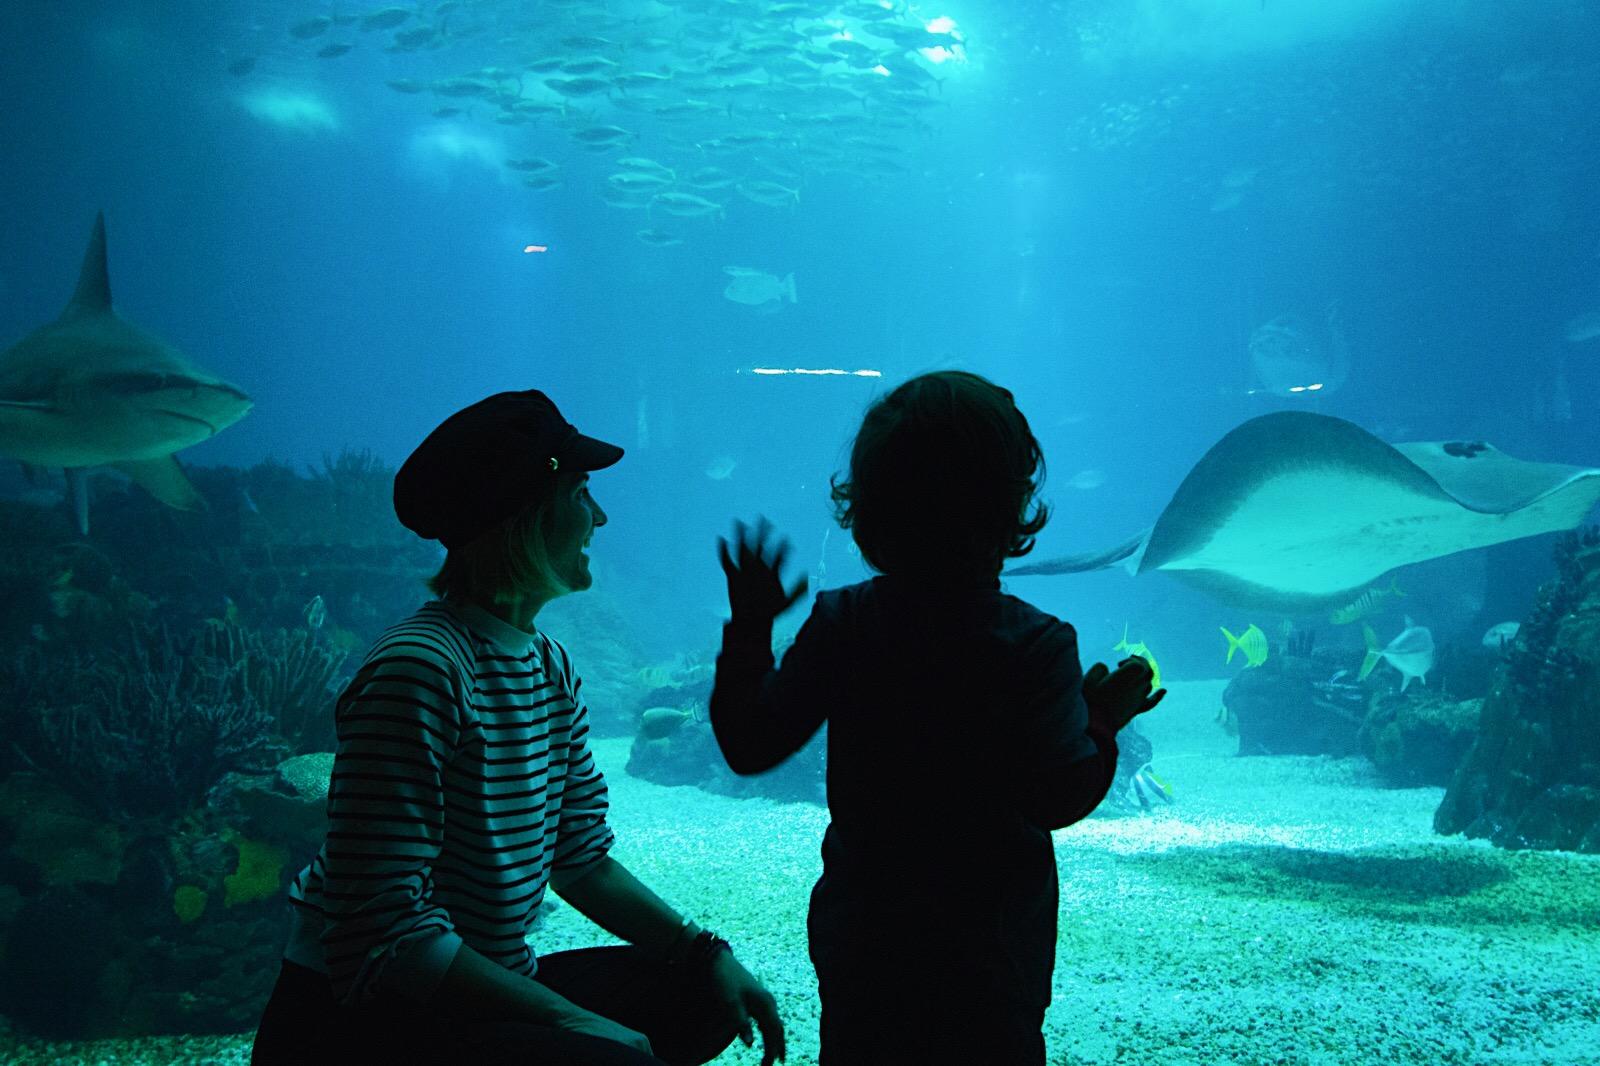 Arte Boheme, Federica Molini, Miami Blogger, Travel Portugal, Portugal aquarium, lisbon aquarium, visit lisbon, Lisboa